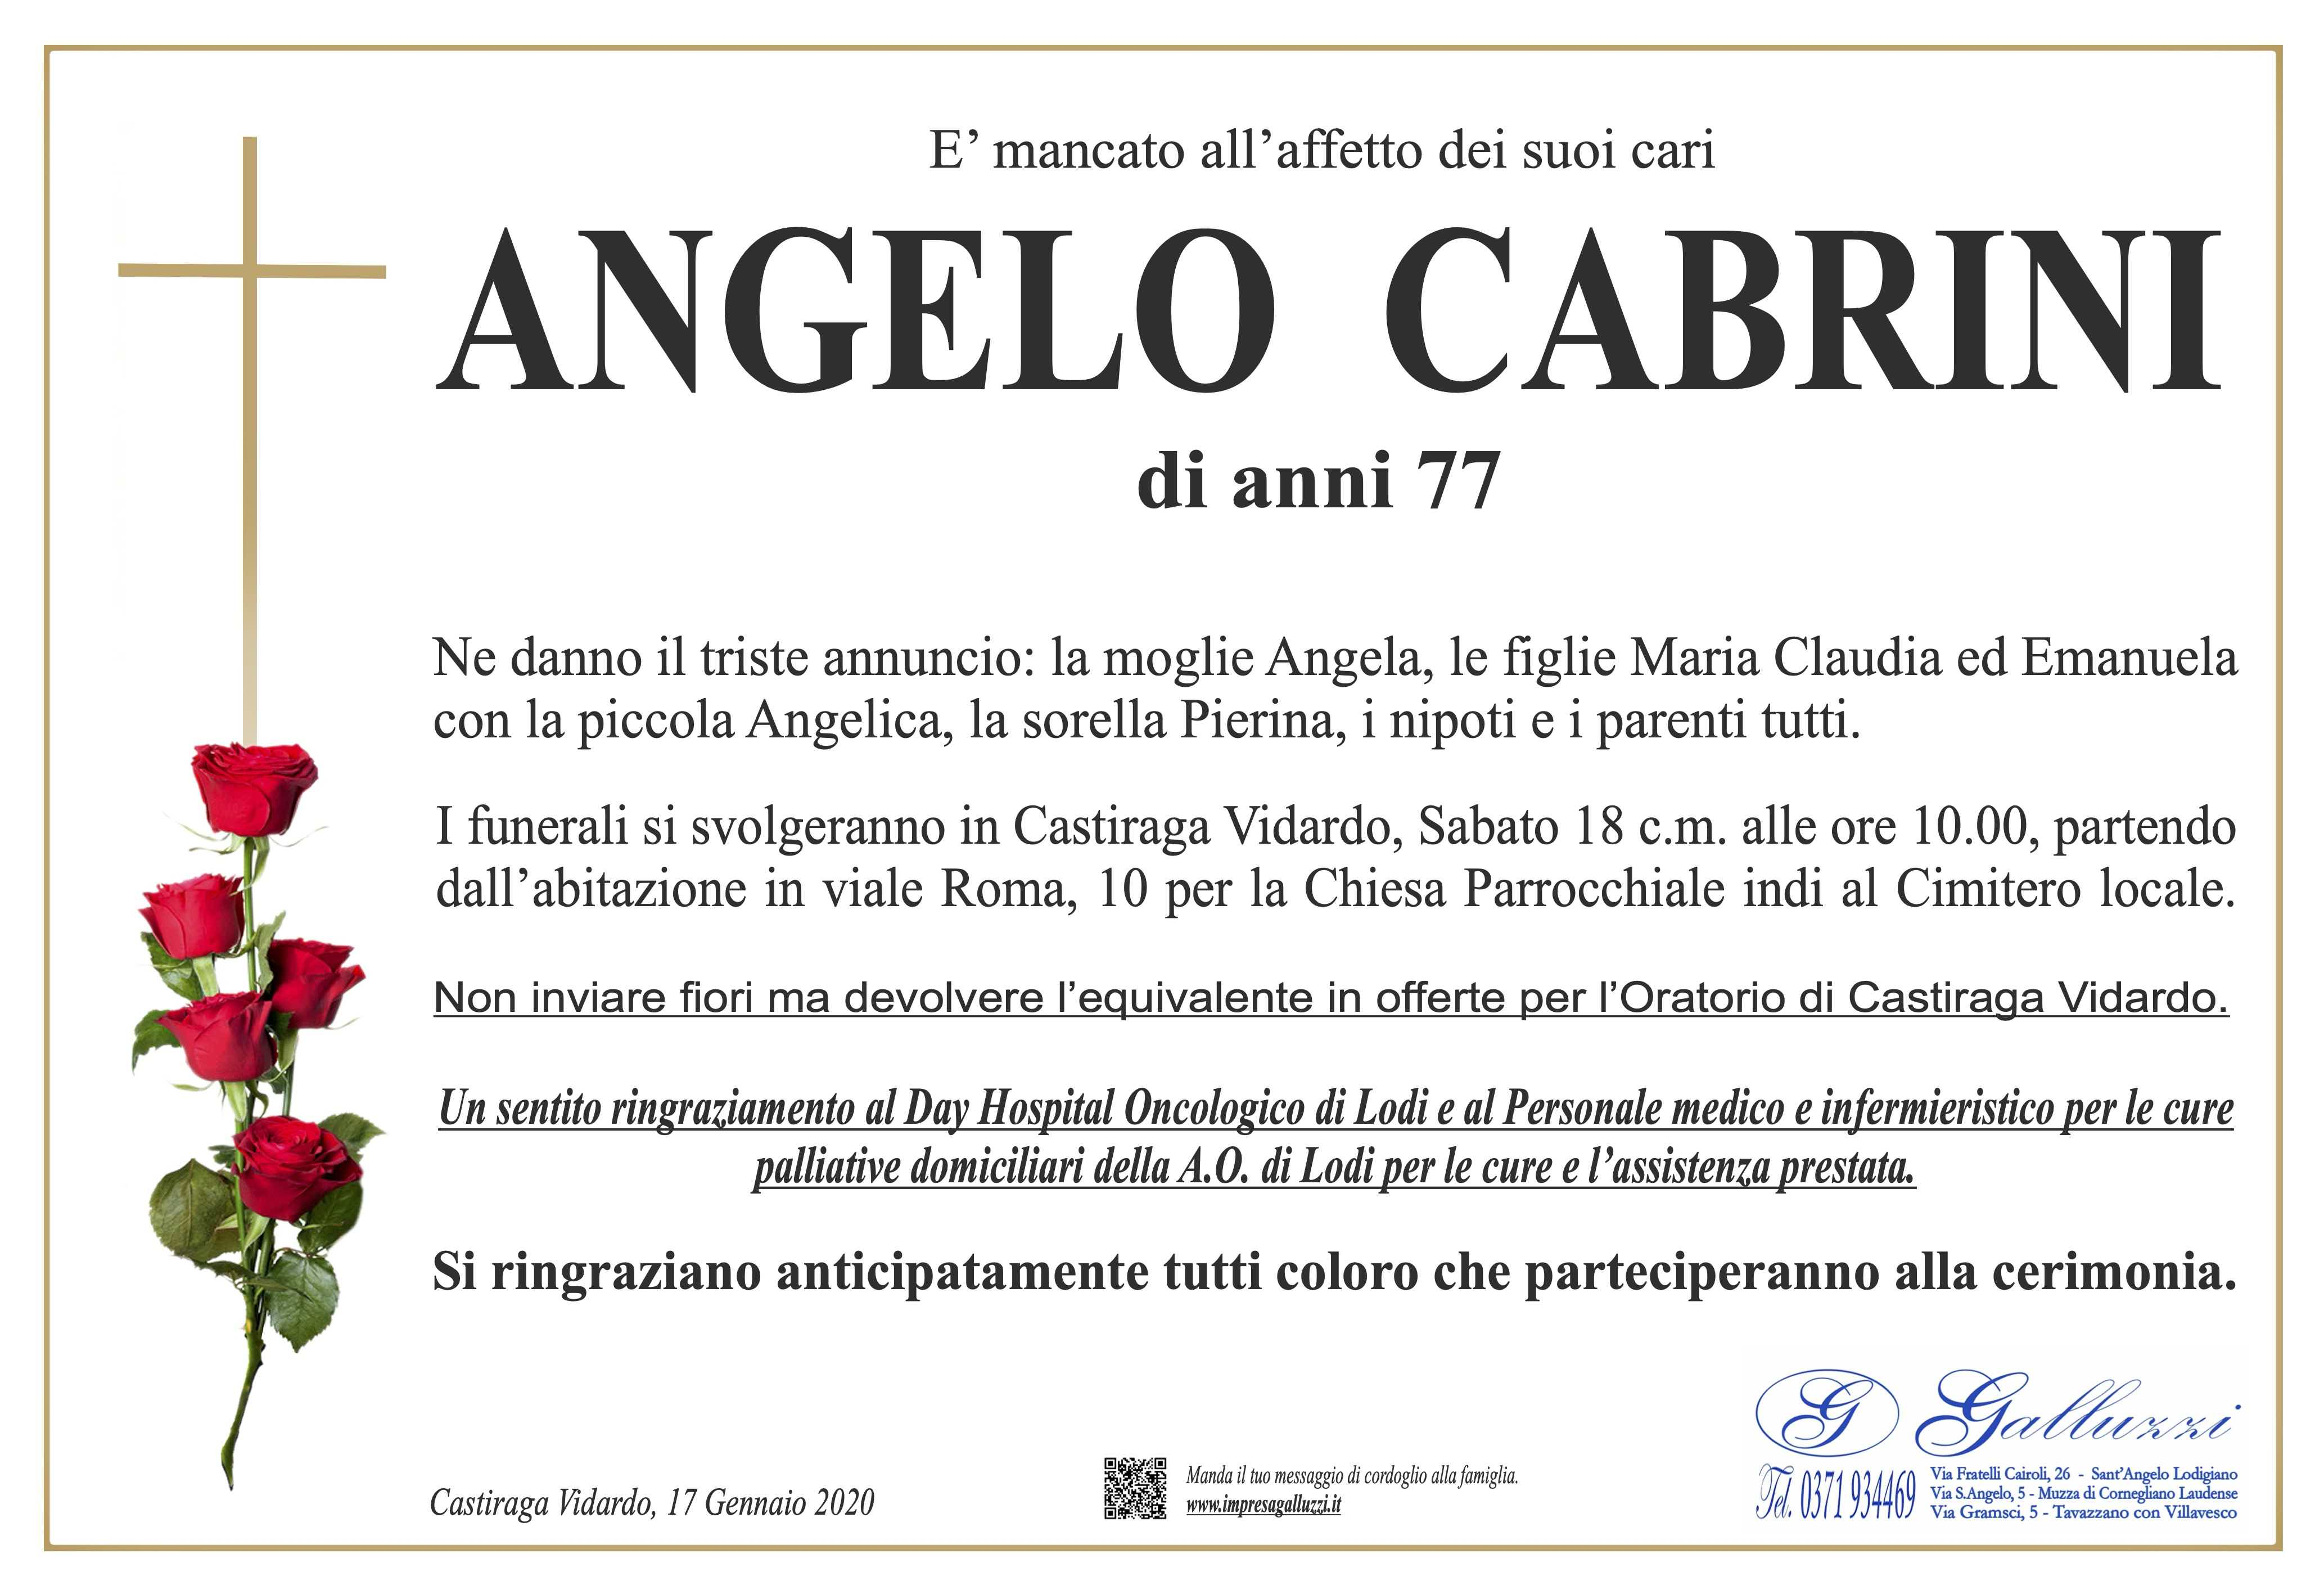 Angelo Cabrini